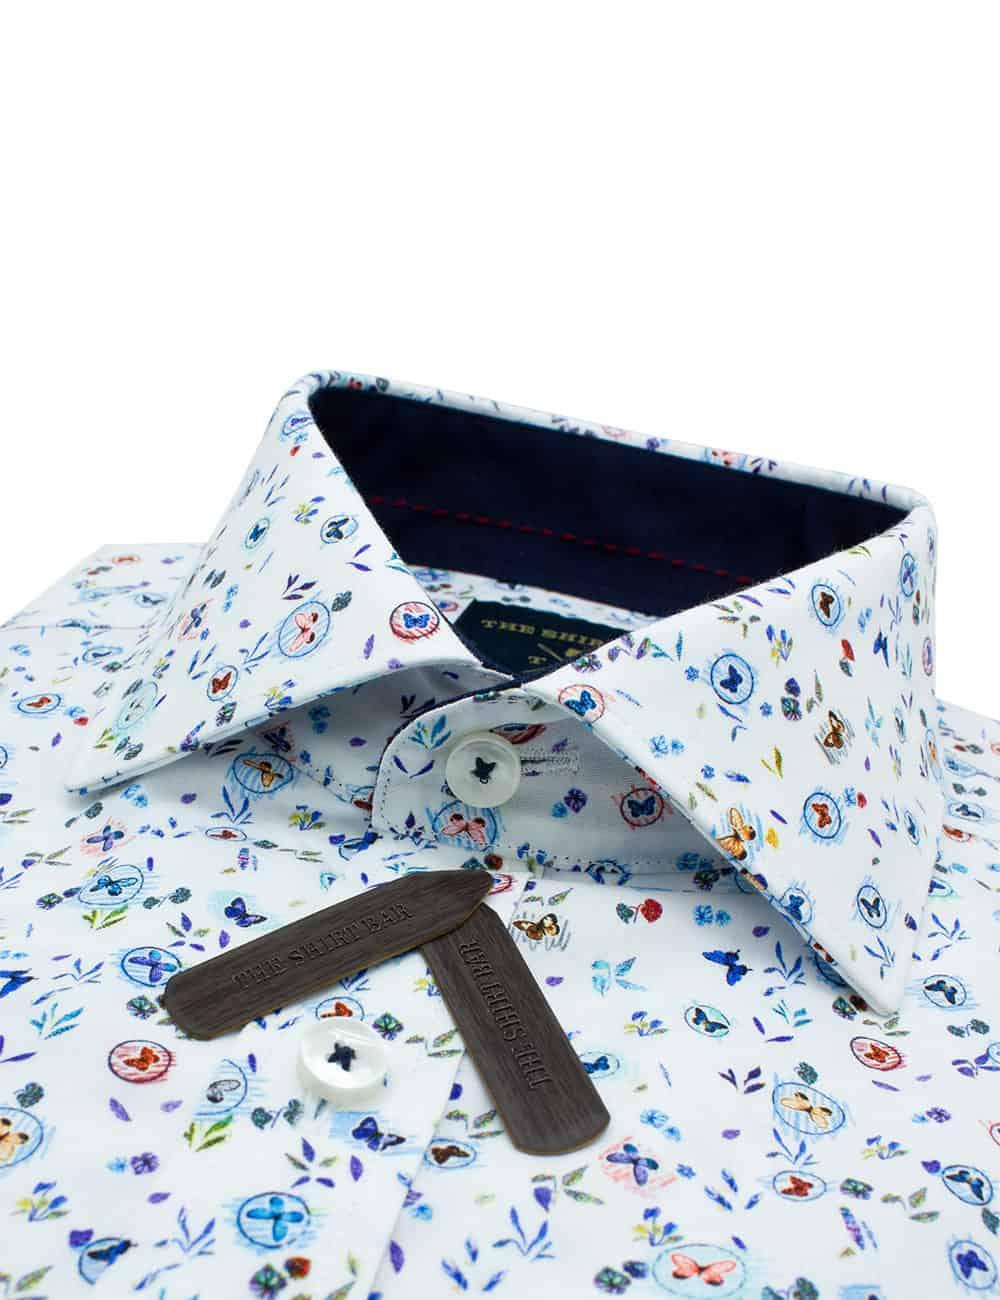 TF Blue Butterfly Premium Italian Fabric Silky Finish Digitally Printed Long Sleeve Single Cuff Shirt TF45A1.13